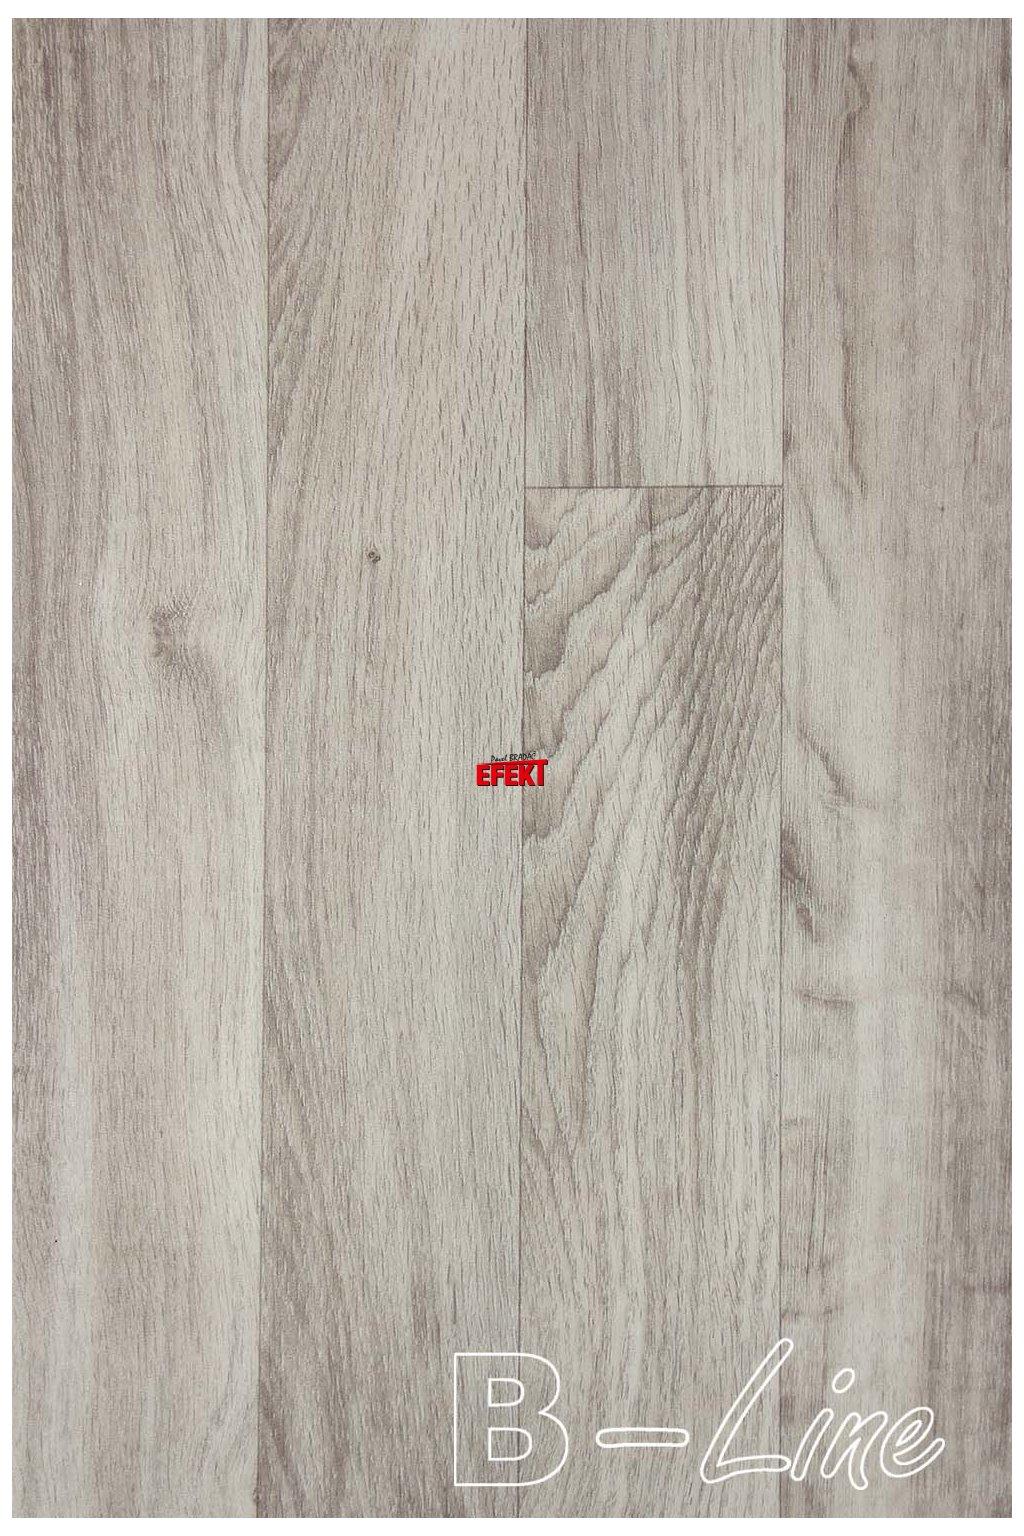 Xtreme-Golden Oak 696L